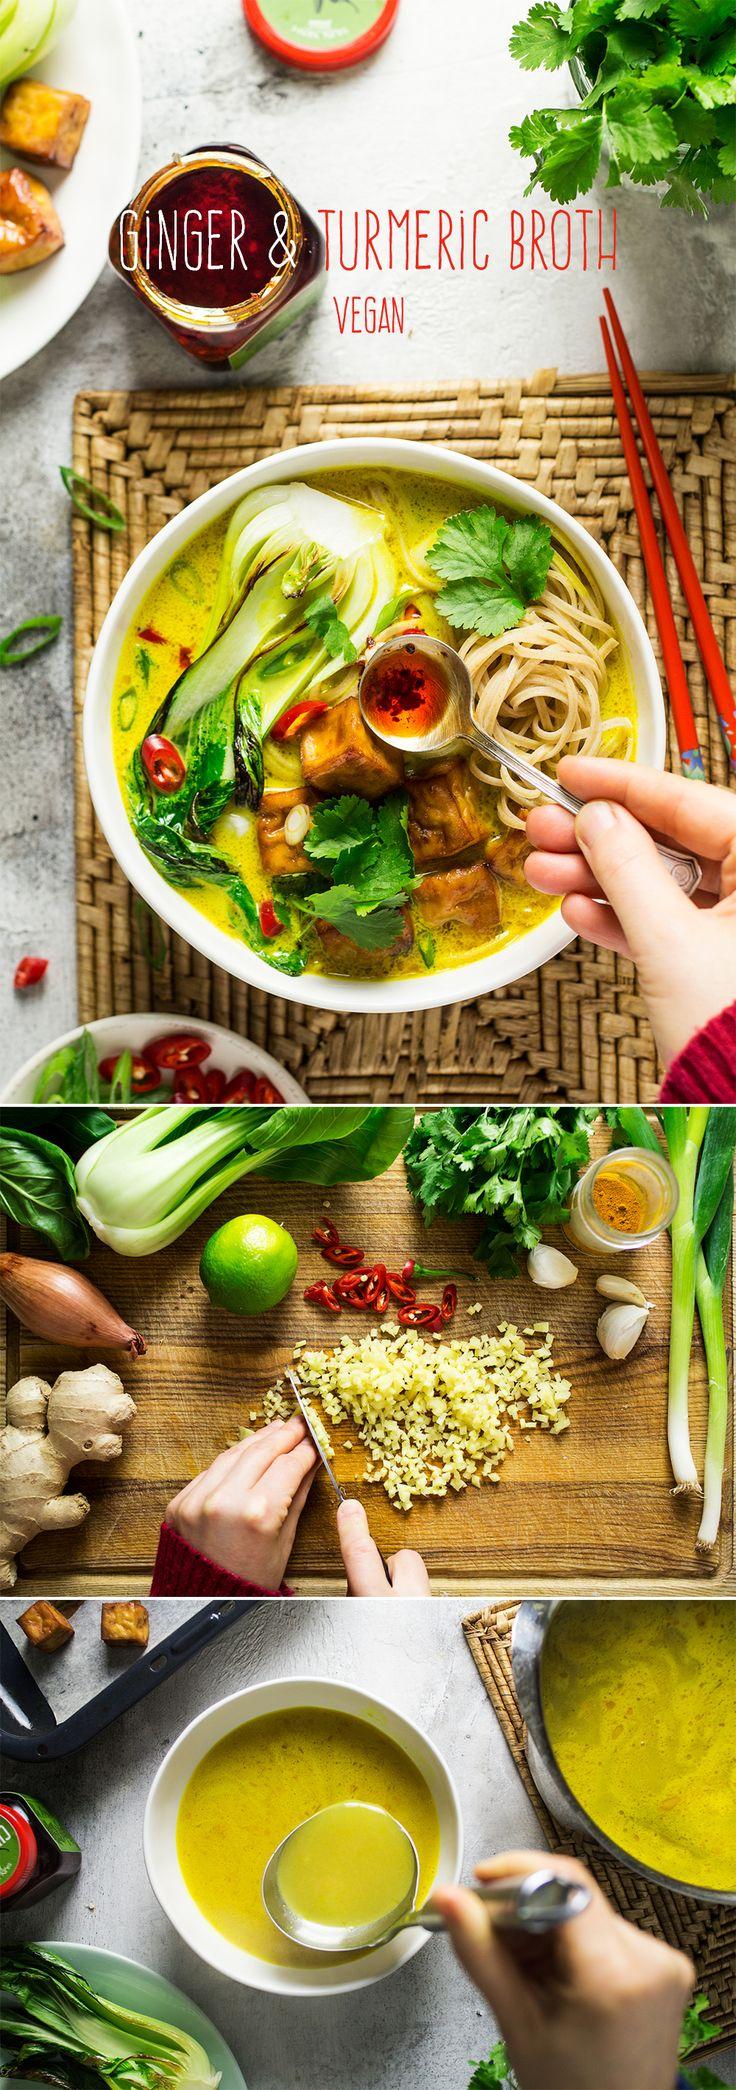 #vegan #ginger #broth #lunch #dinner #glutenfree #turmeric #healthy #soup #entree #tofu #noodles #noodlesoup #vegetarian